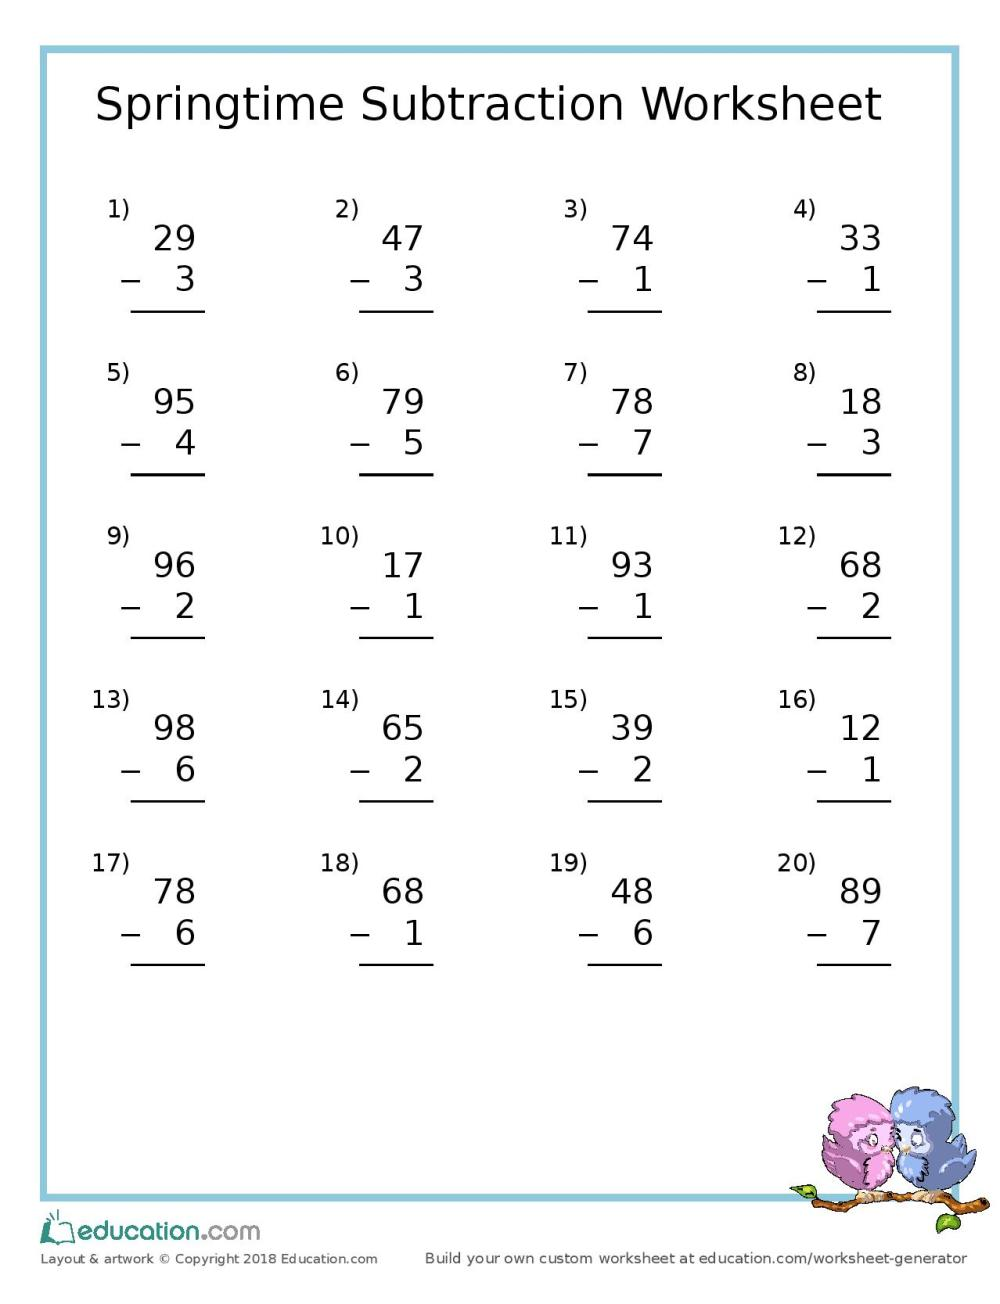 medium resolution of Free Spring Subtraction Worksheet – Today's Catholic Homeschooling